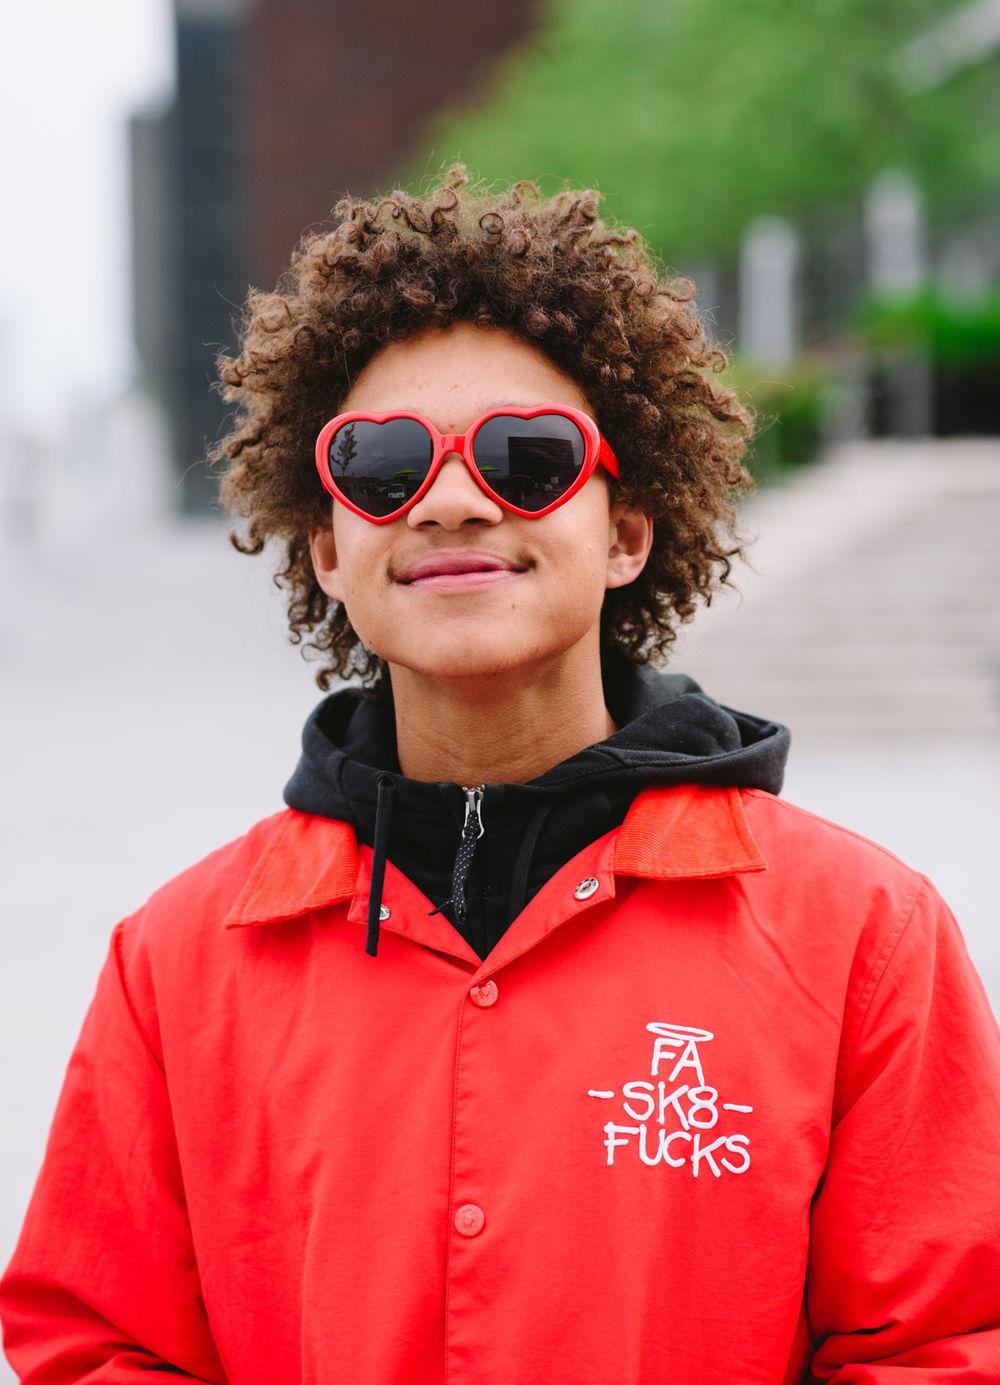 _IHC6569e-Kevin-Bradley-Nike-SB-Copenhagen-Open-Day-5-July-2015-Photographer-Maksim-Kalanep